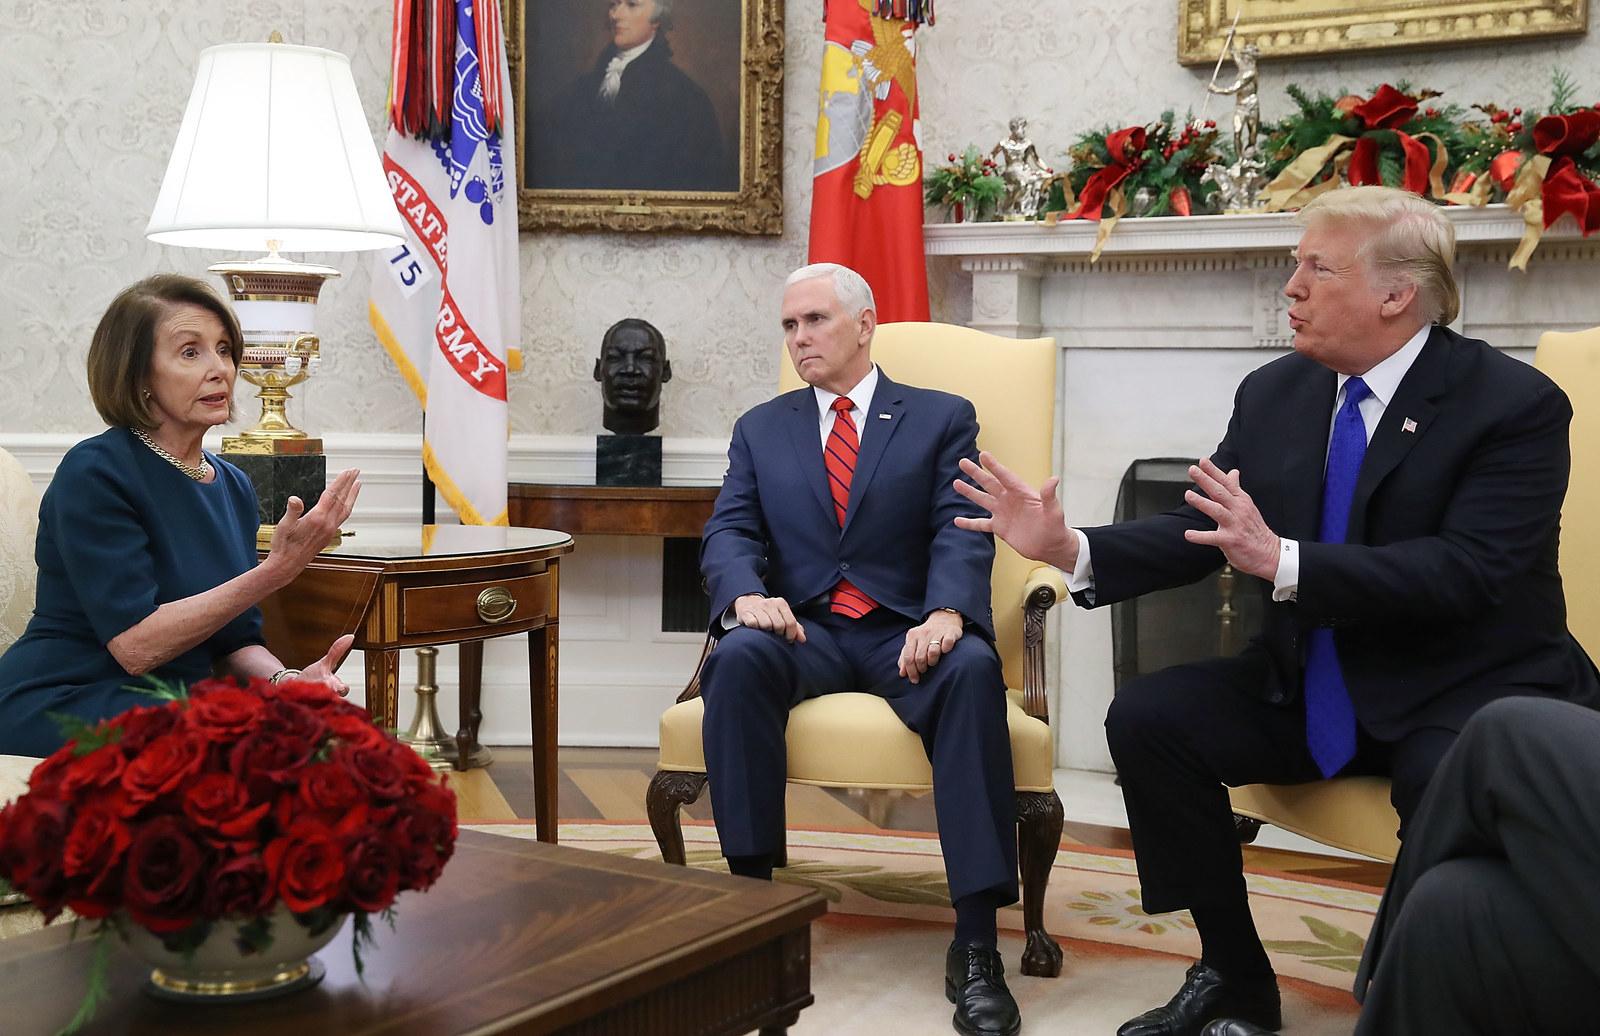 President Donald Trum, Vice President Mike Pence, and Speaker Nancy Pelosi in December.